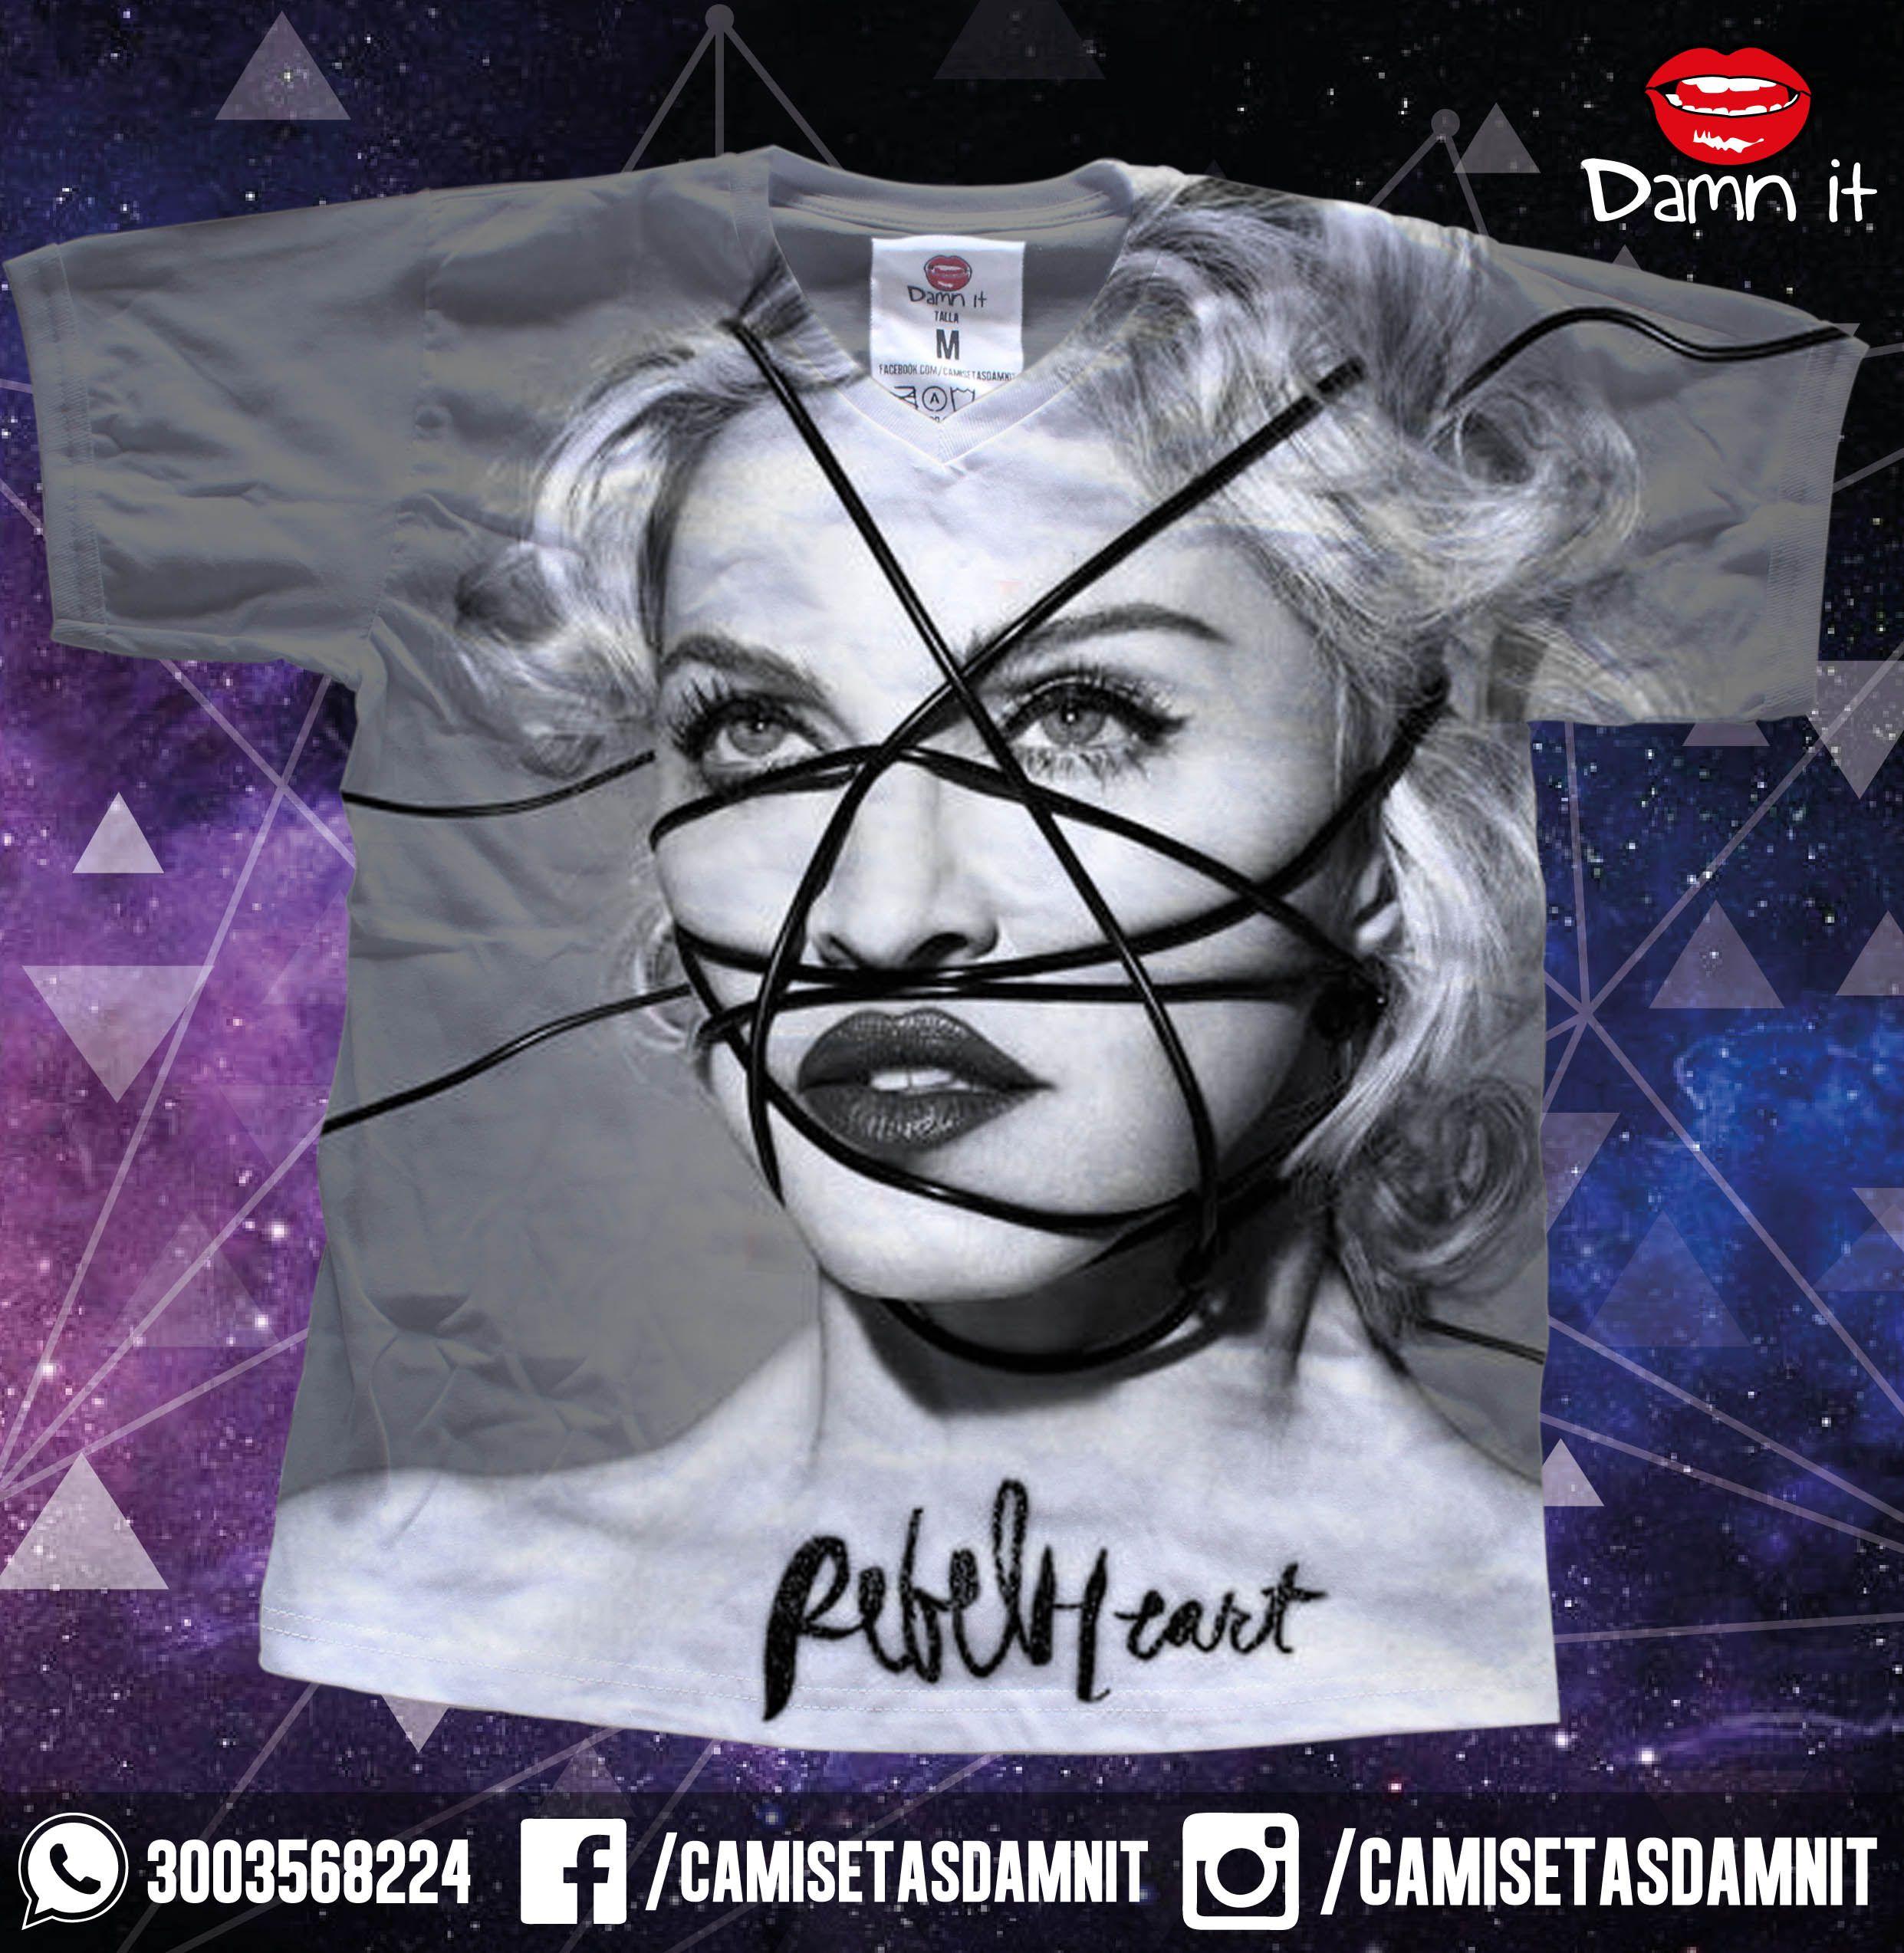 Camiseta Rebel Heart  https://www.facebook.com/CamisetasDamnit/